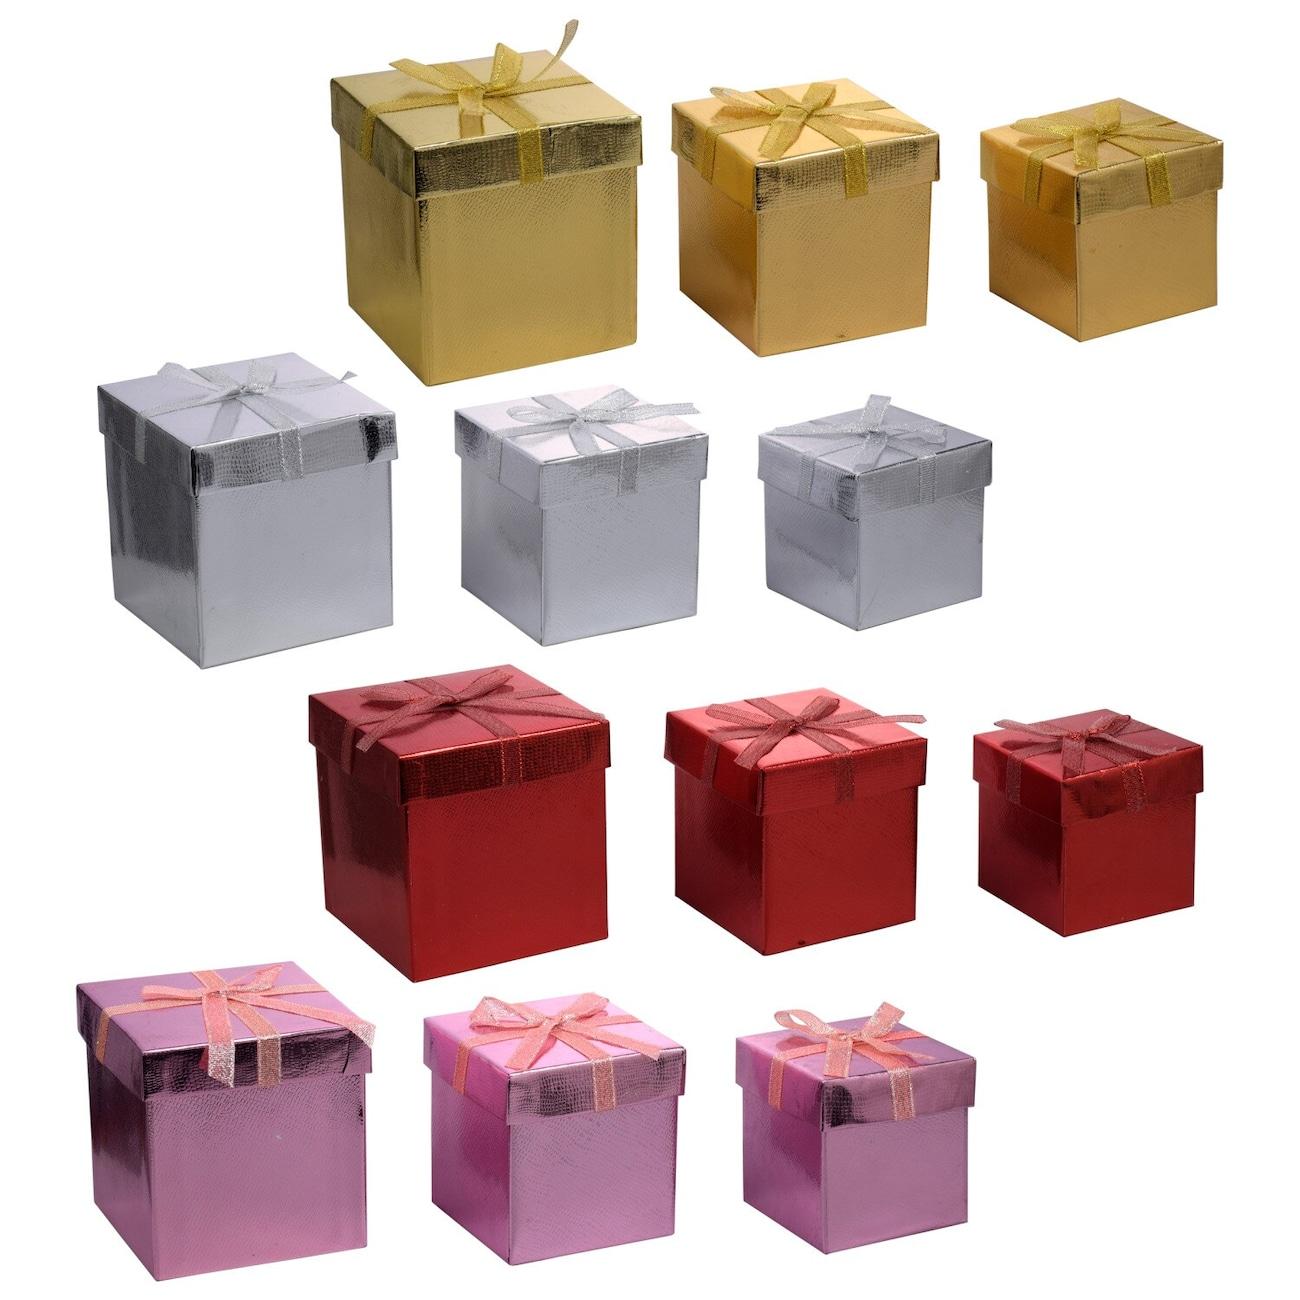 Gift Boxes - Dollar Tree, Inc.